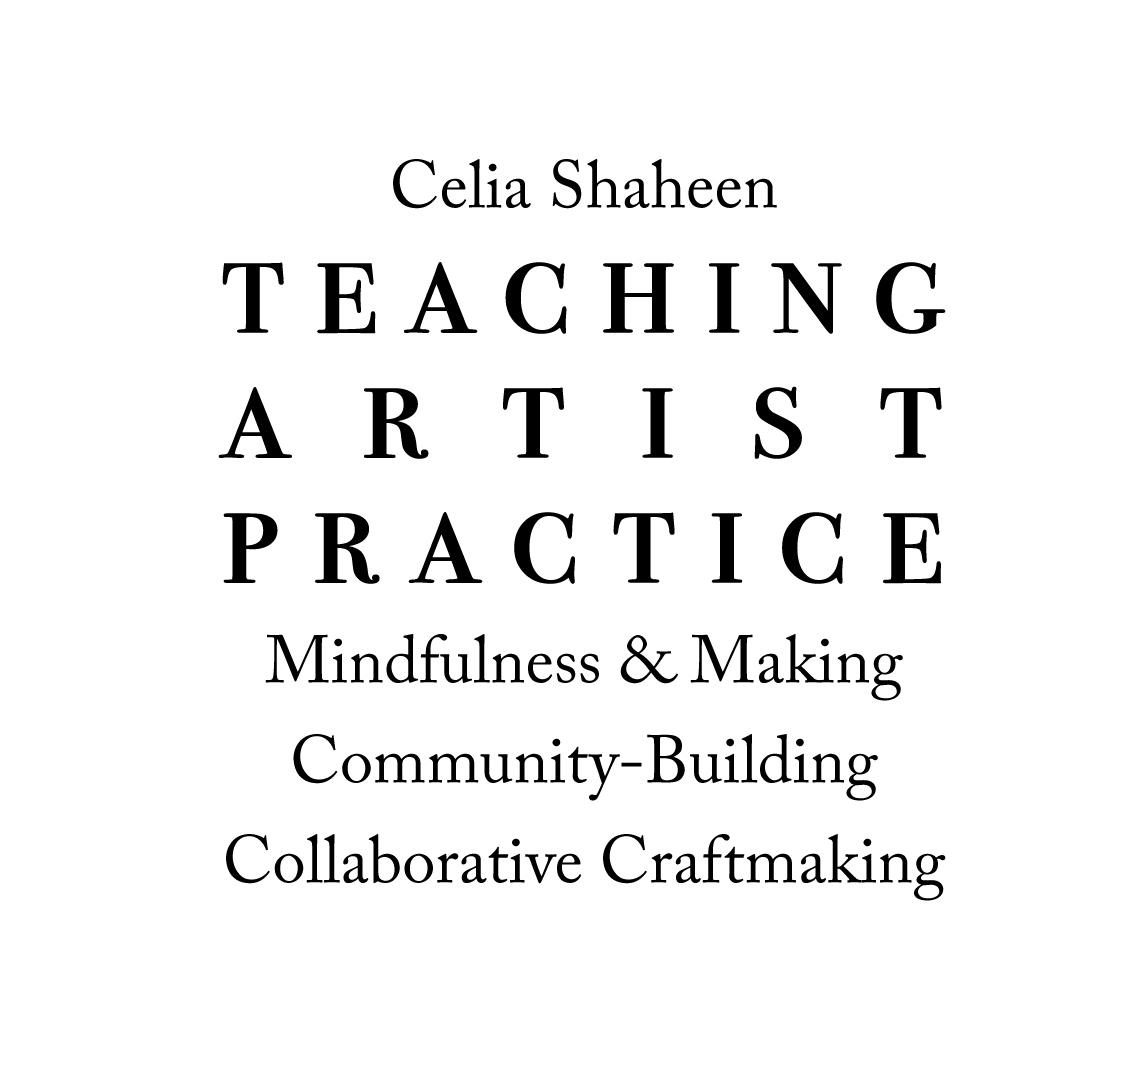 Teaching Artist Philosophy